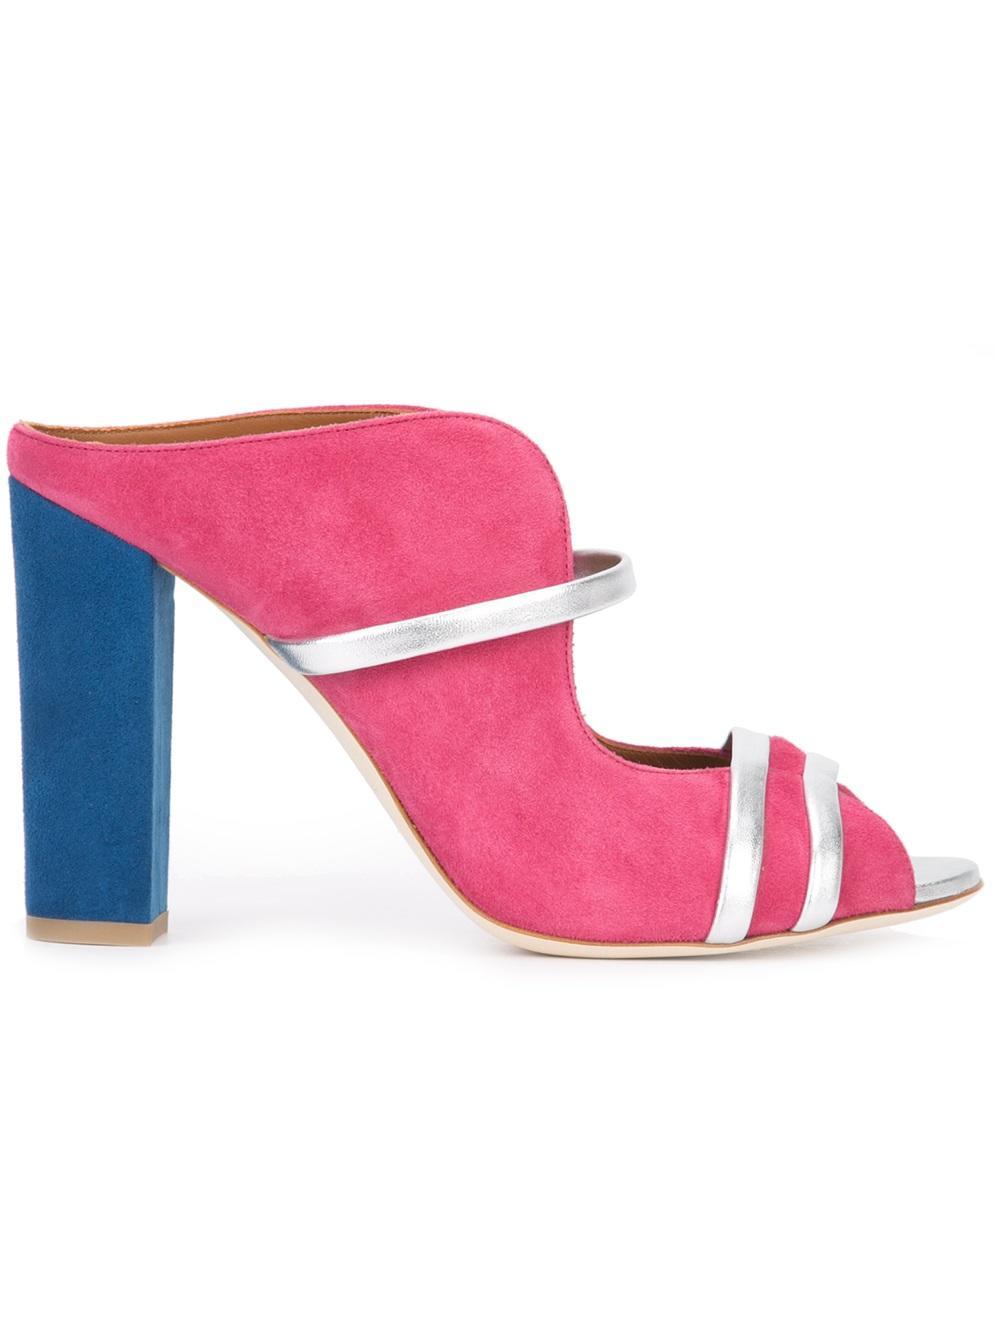 MALONE SOULIERS - 'Maureen' sandals  $625